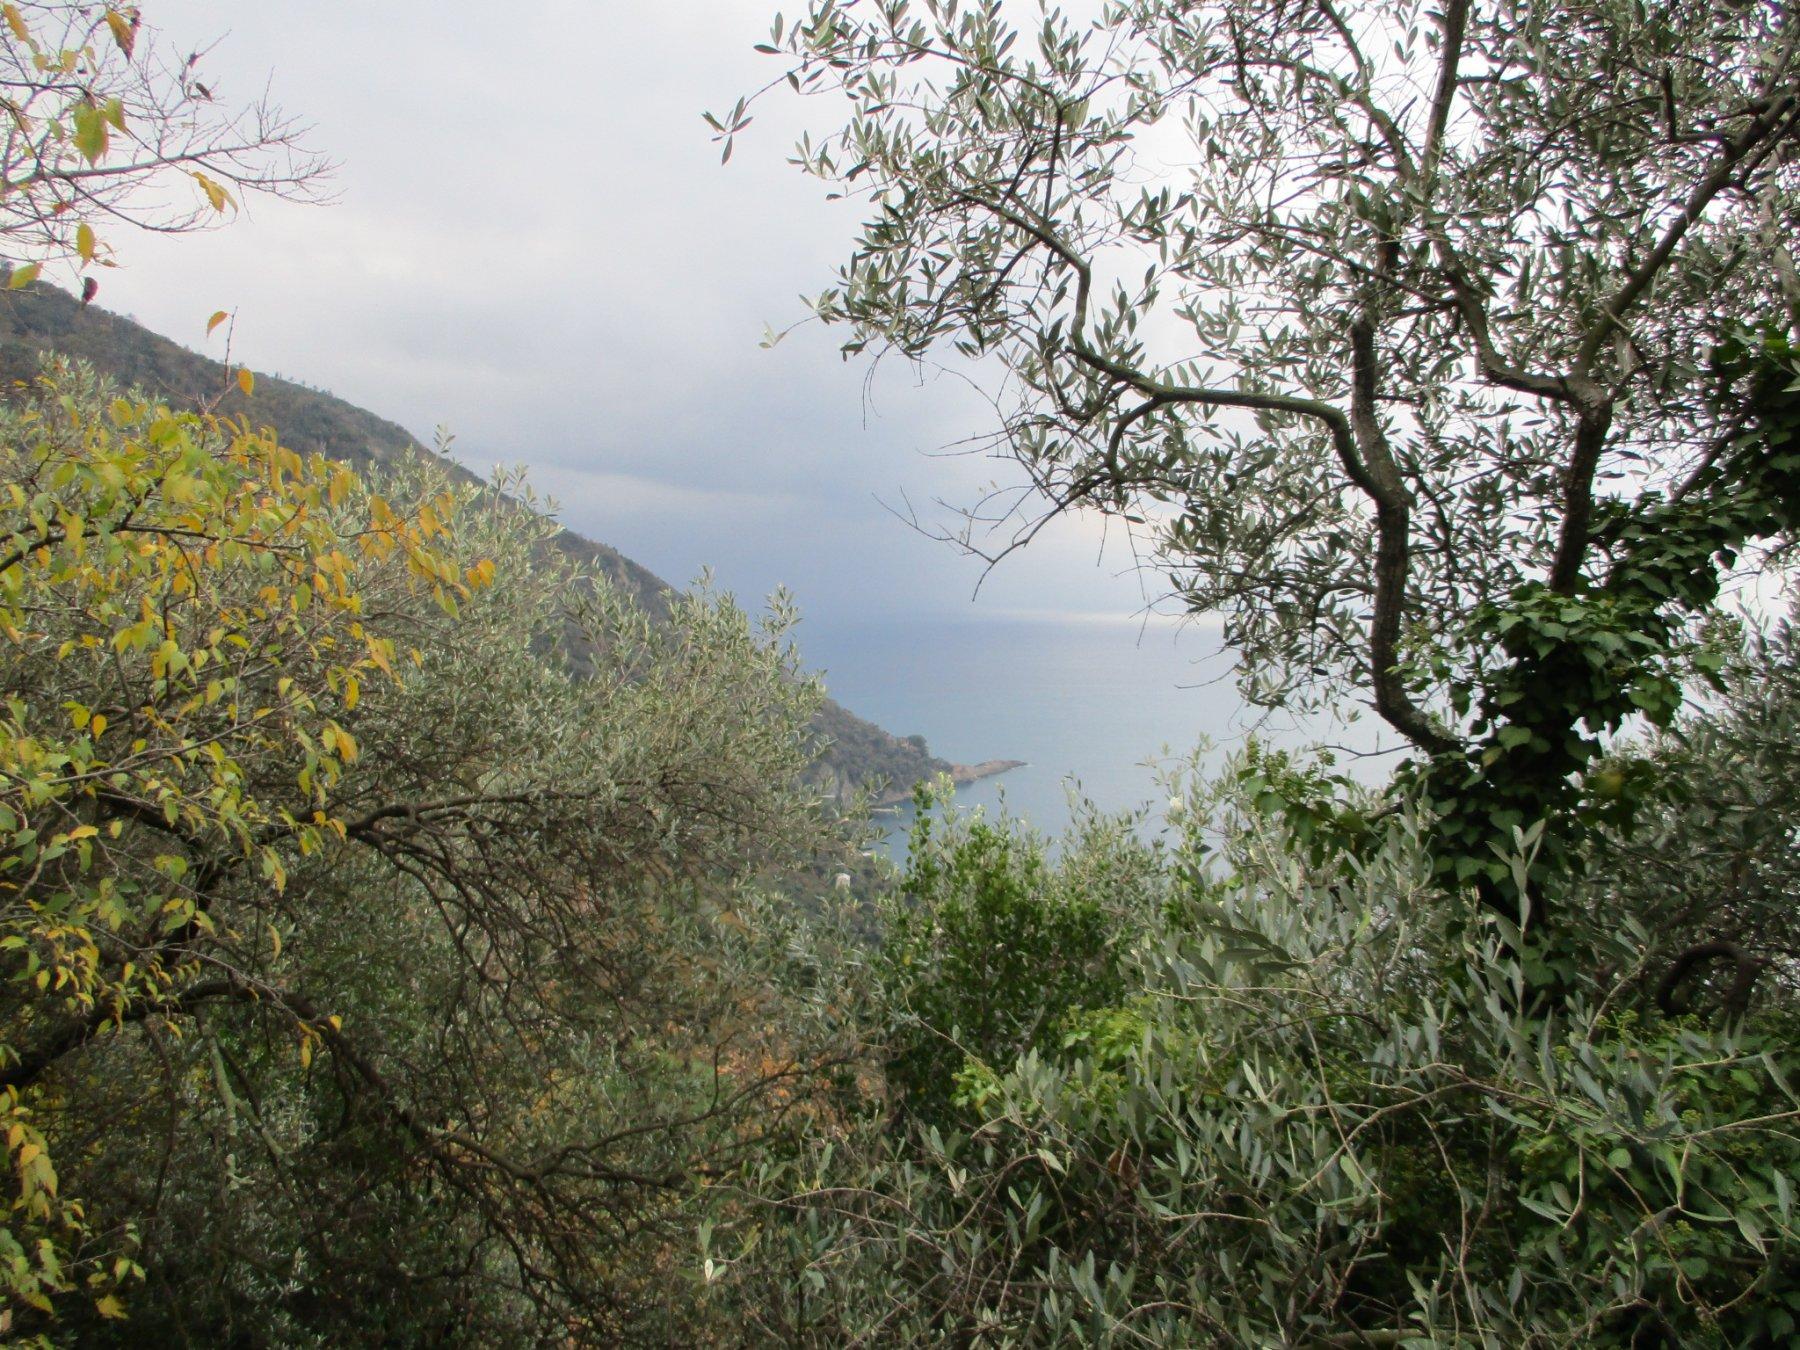 In basso Punta Chiappa